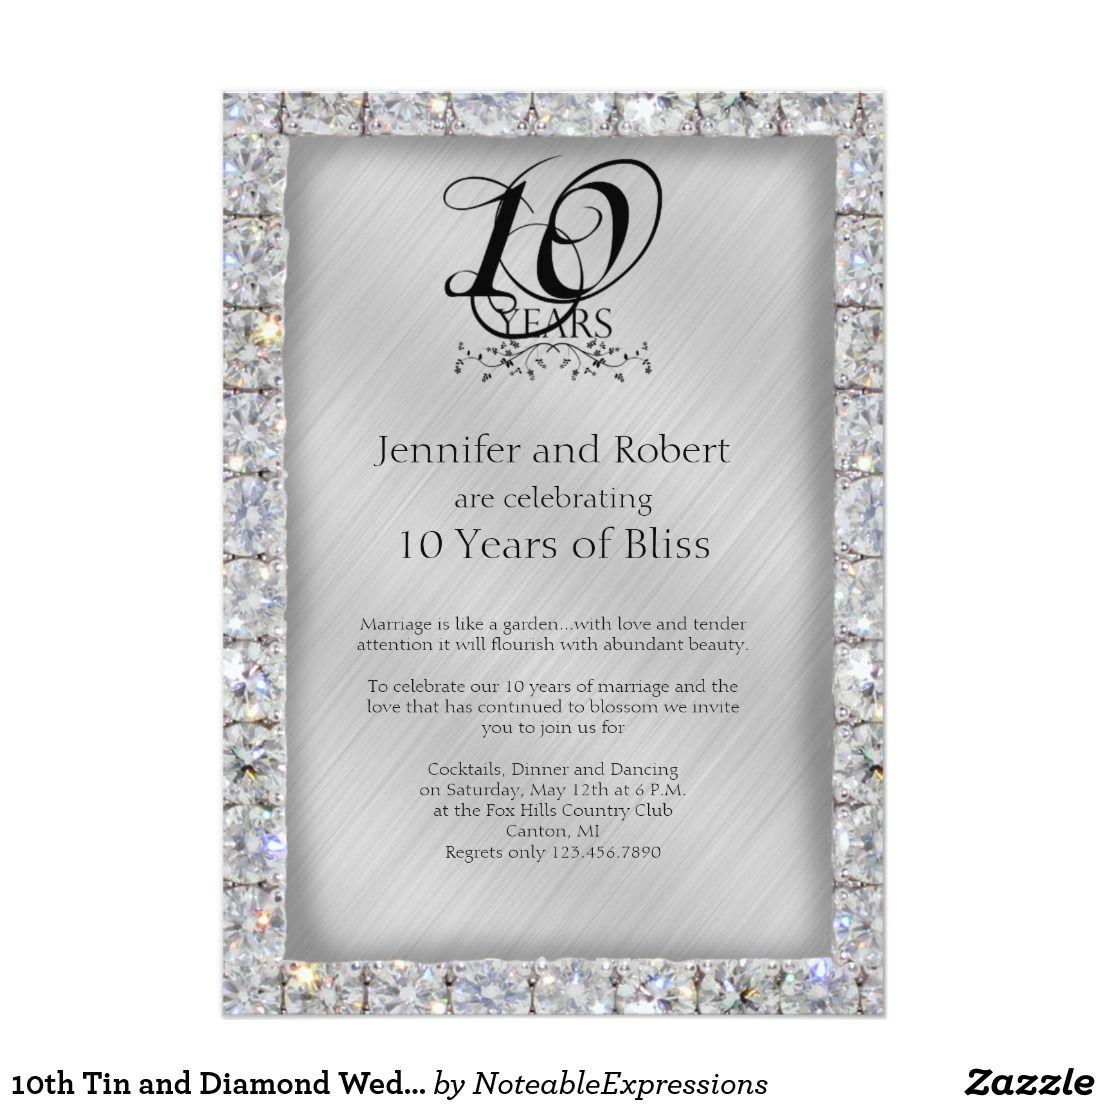 10th Tin and Diamond Wedding Anniversary Card   Wedding anniversary ...